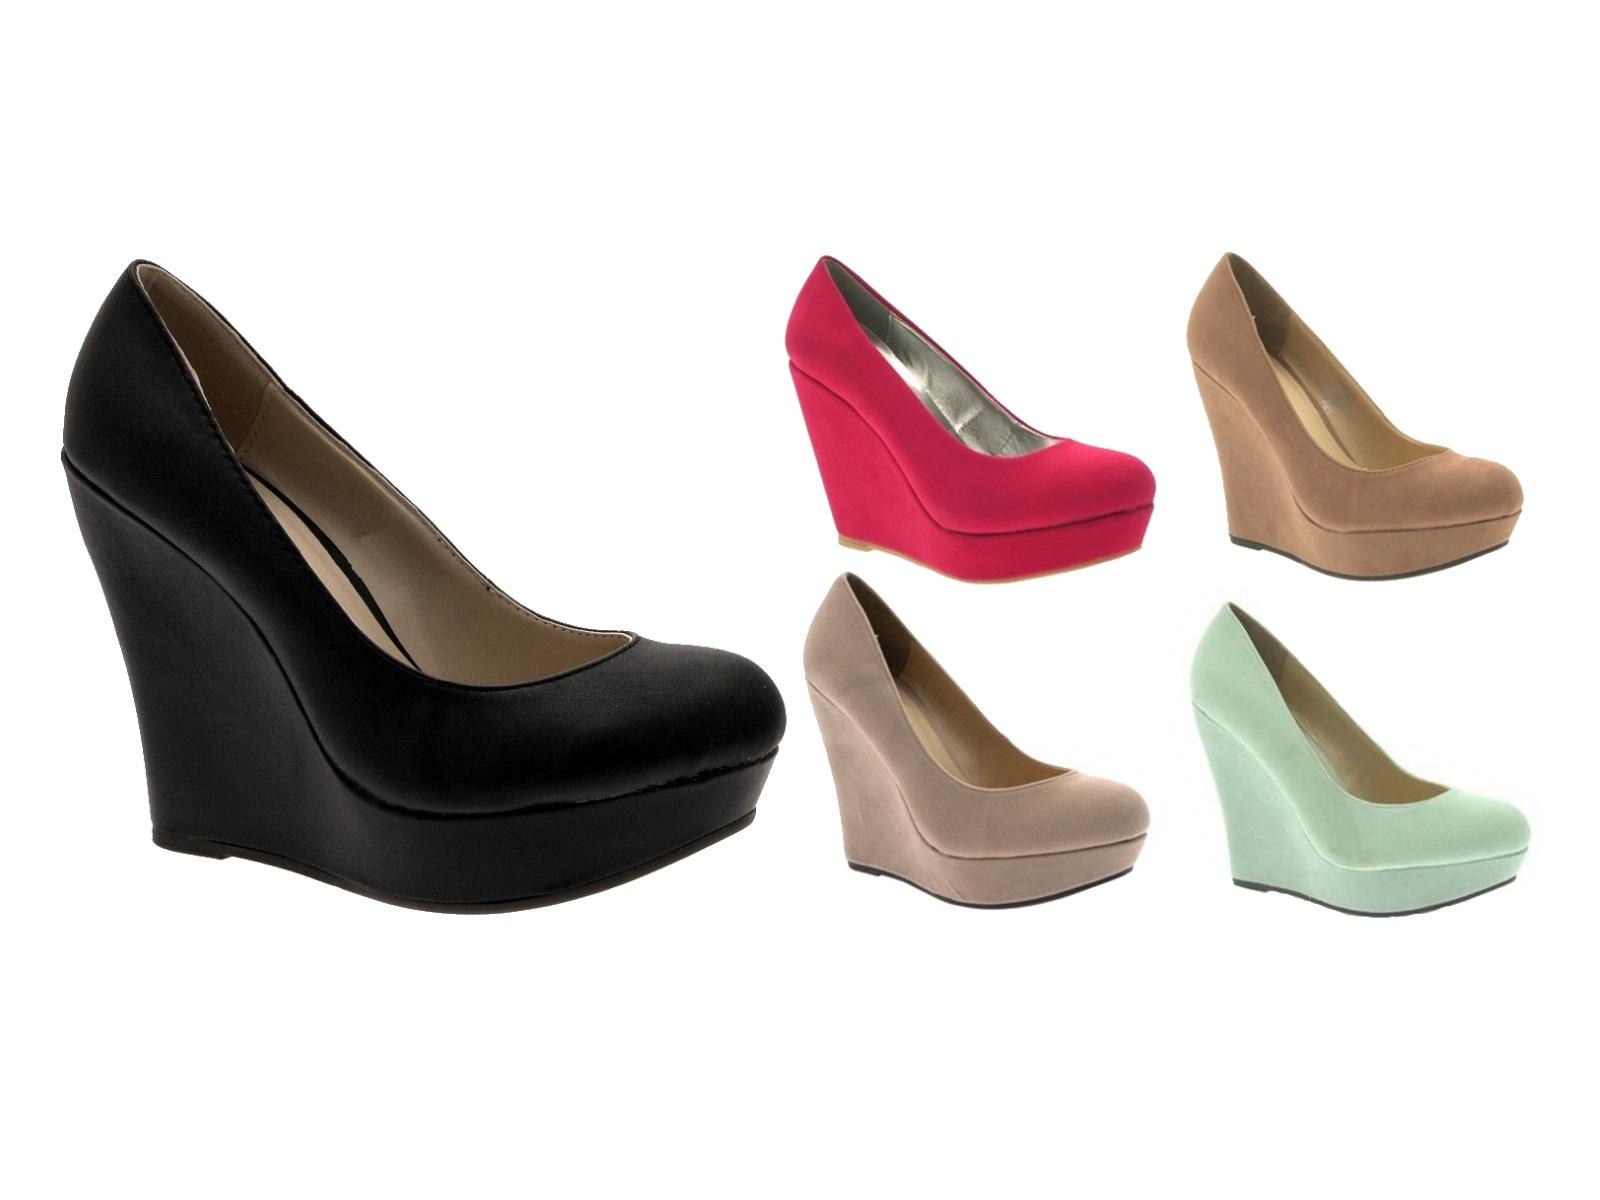 Womens Wedge Platforms High Heels Full Toe Court Shoes